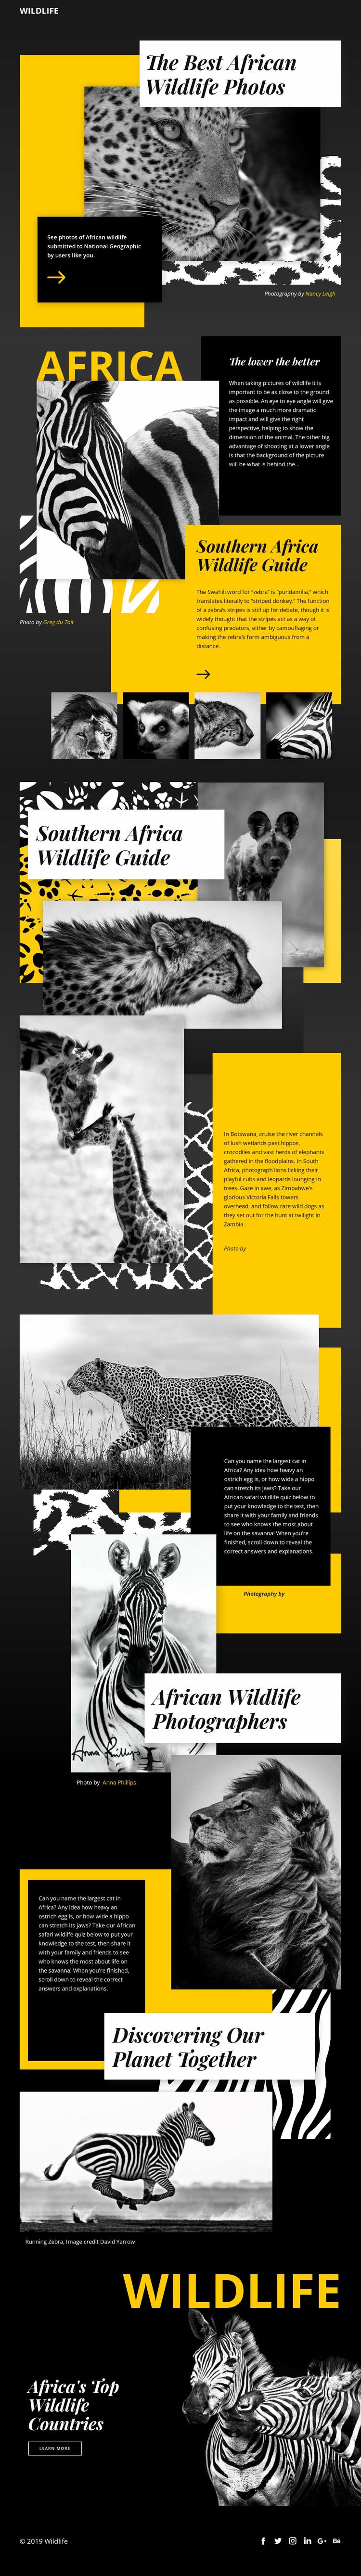 Wildlife Photos Website Design